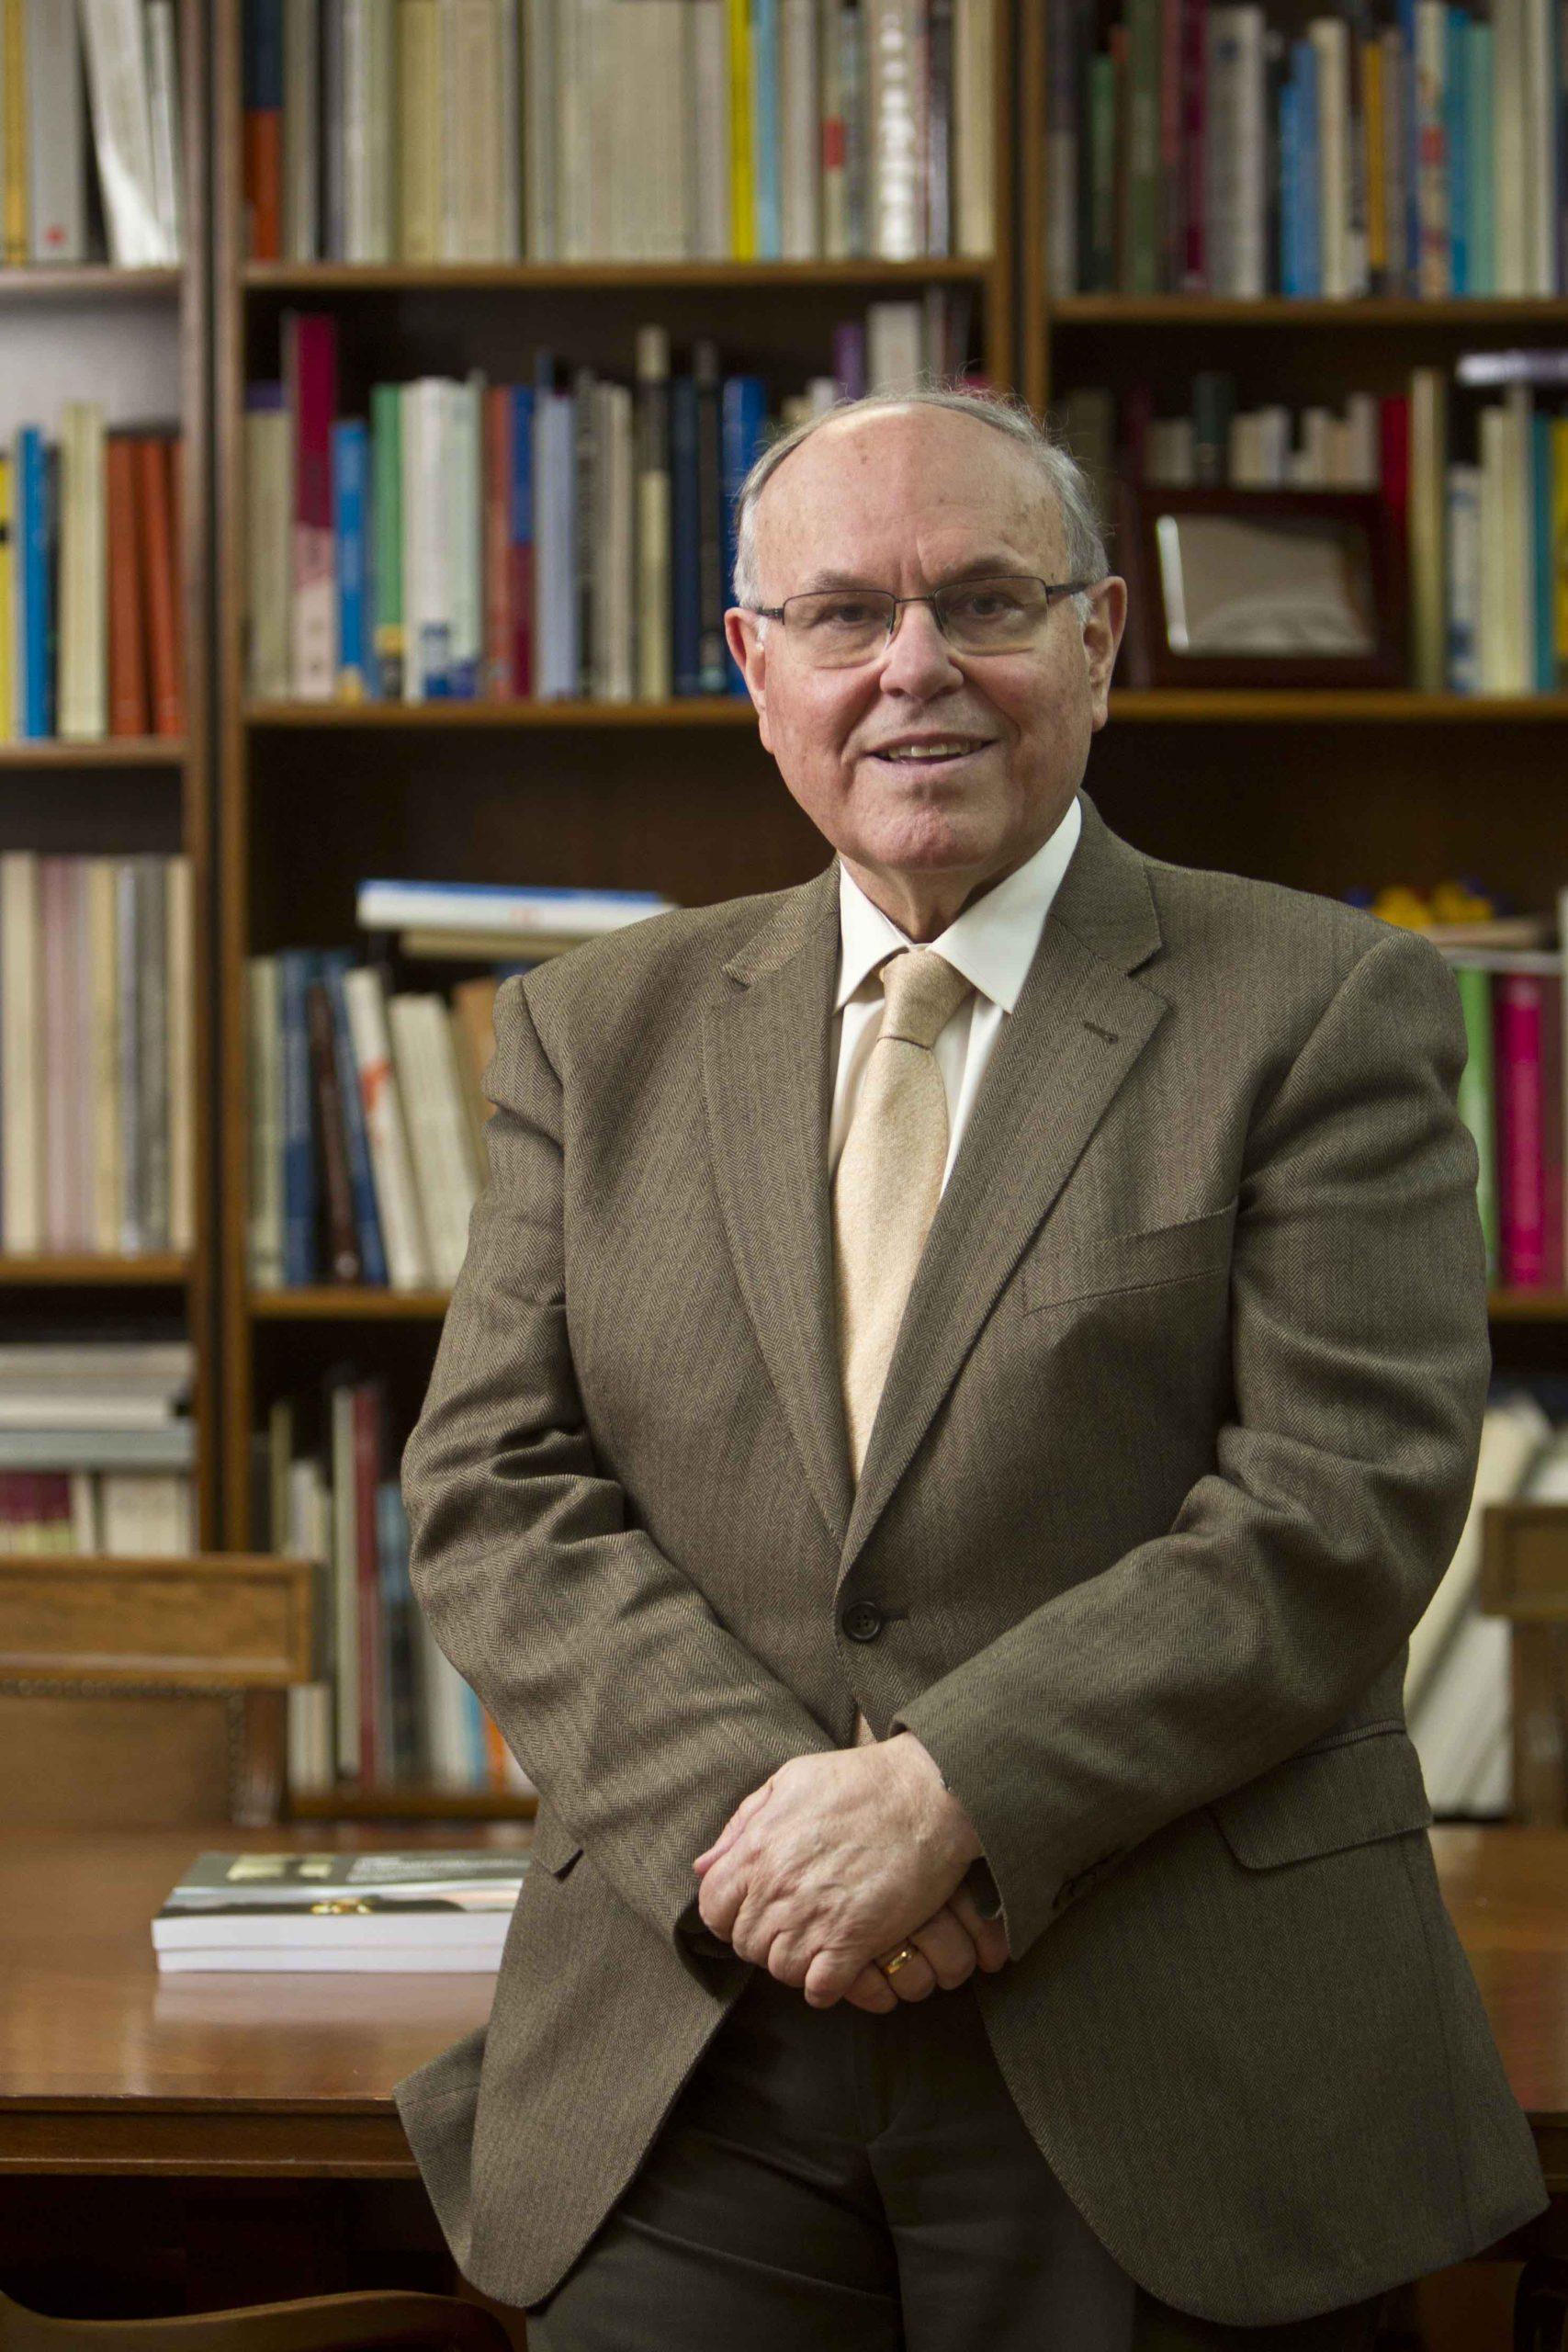 Dr. César Nombela Cano